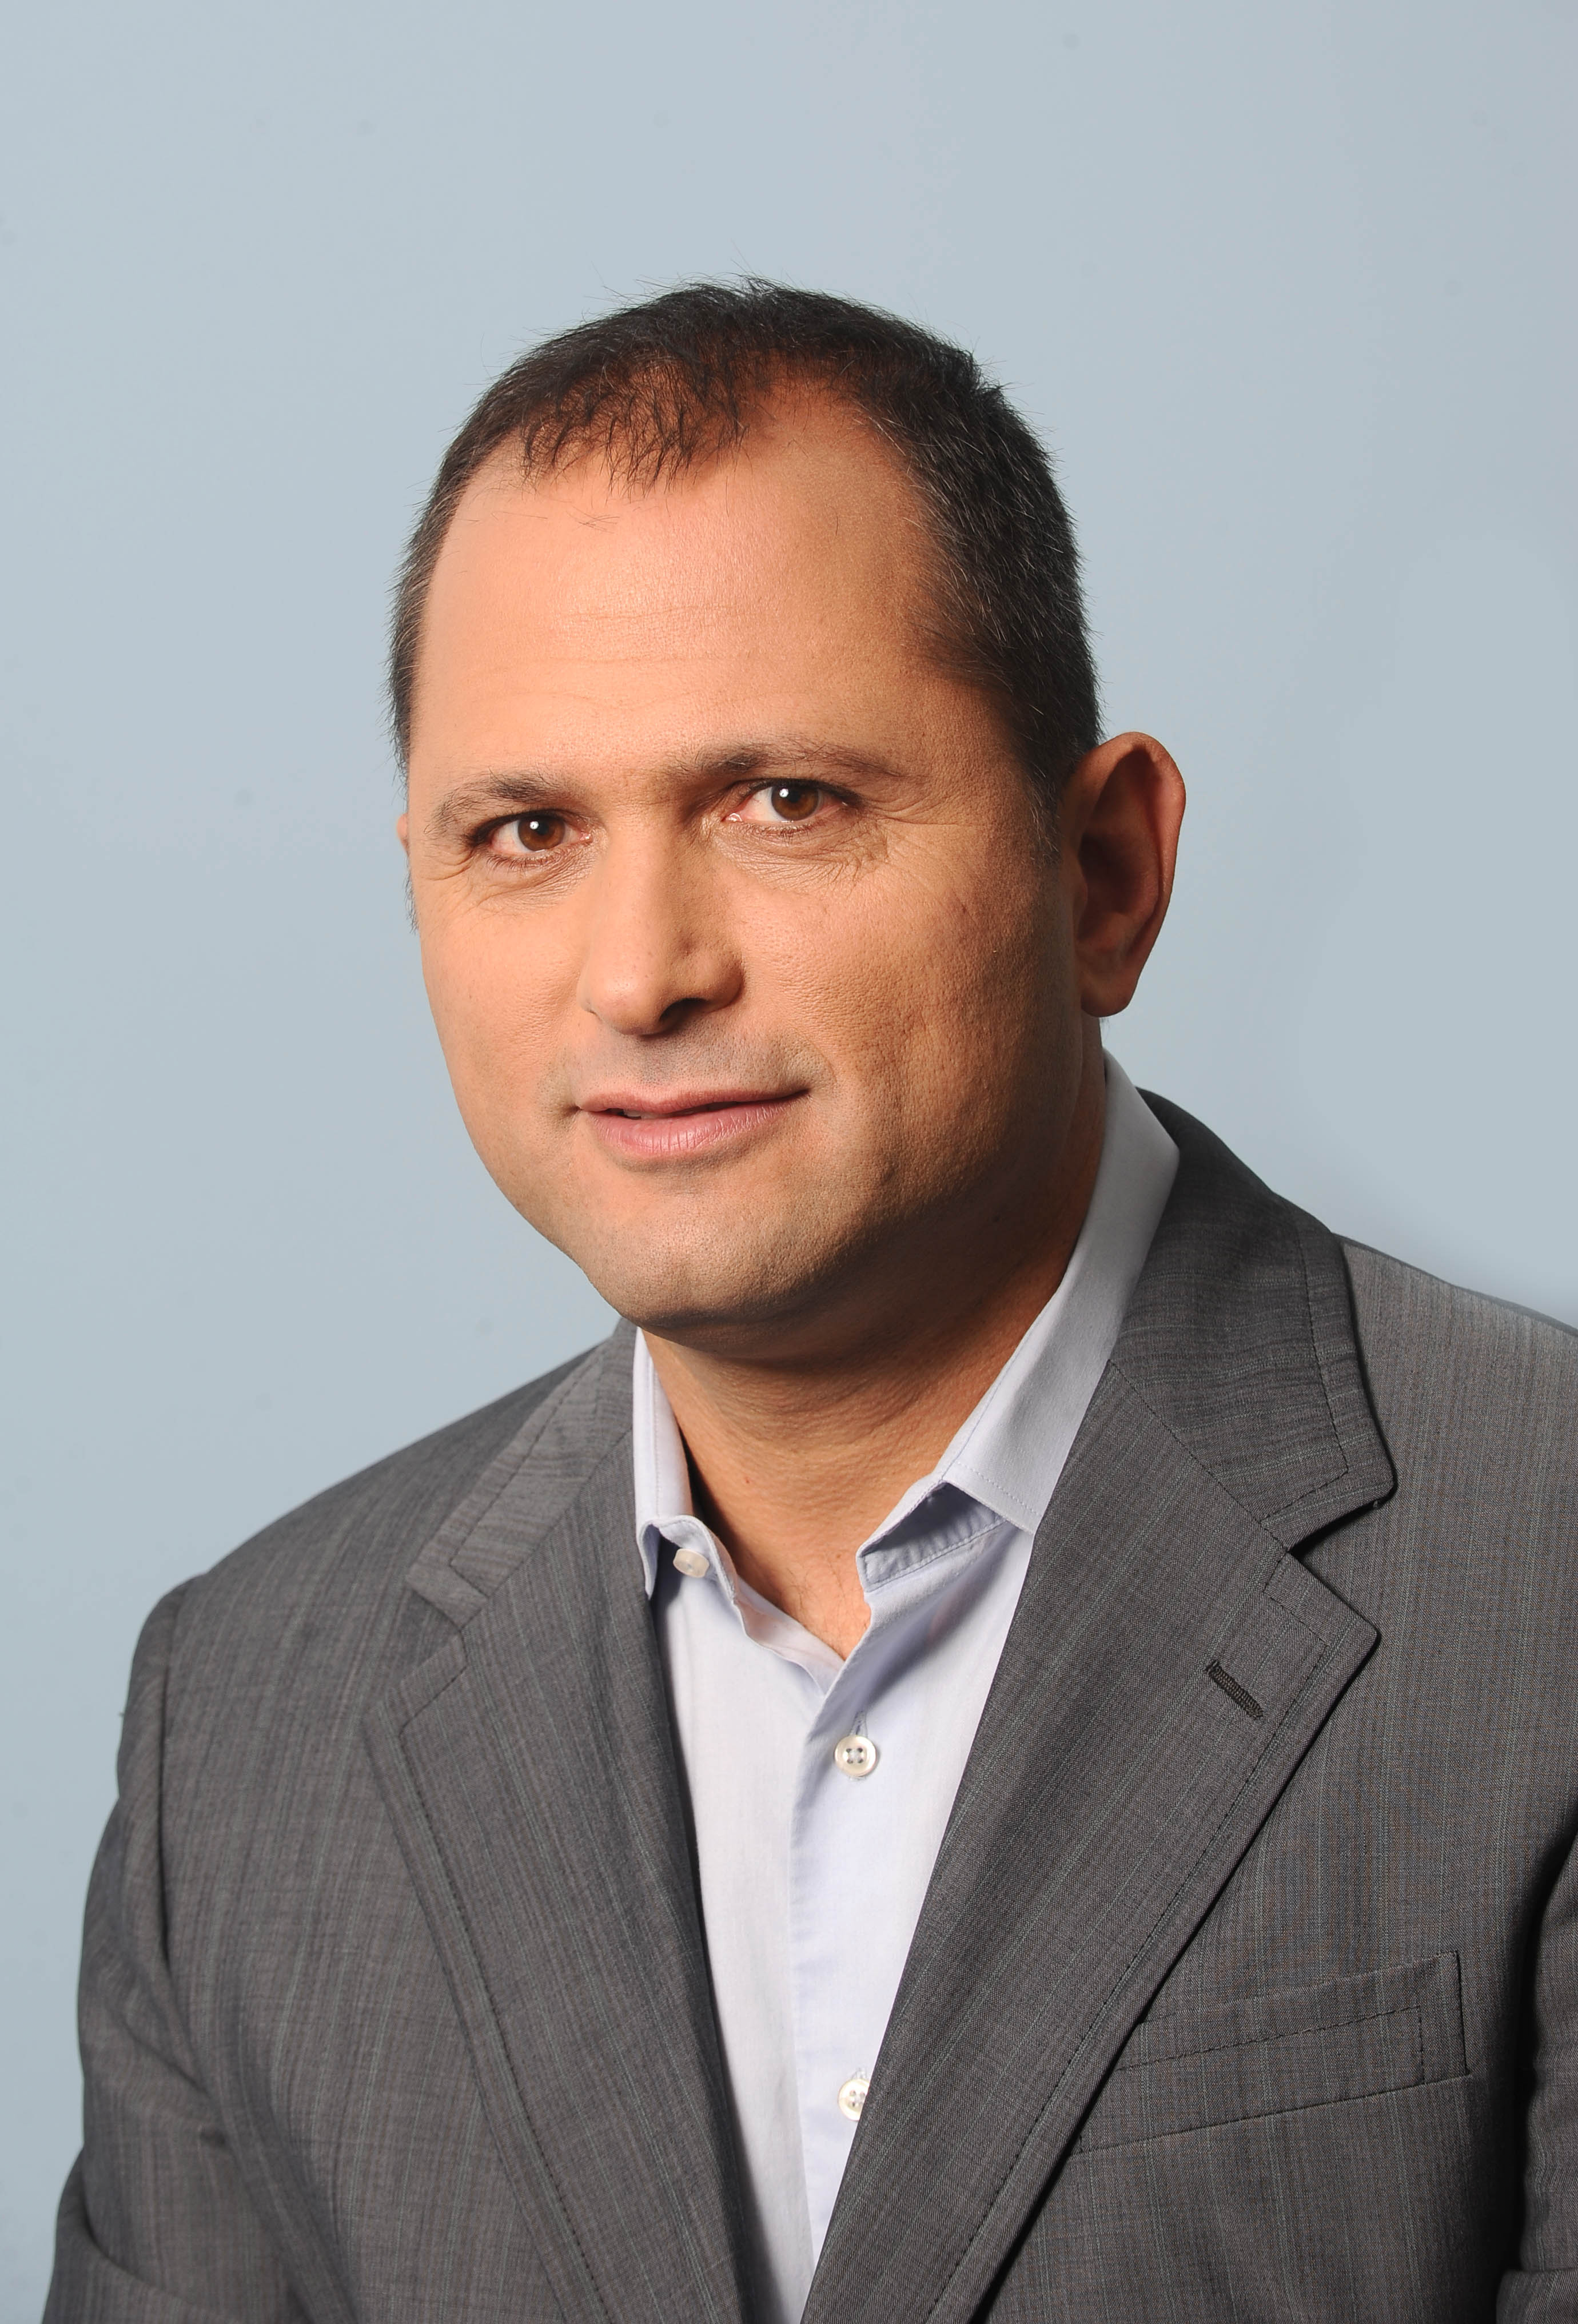 Efi Dahan – Regional Director Africa and Israel, PayPal